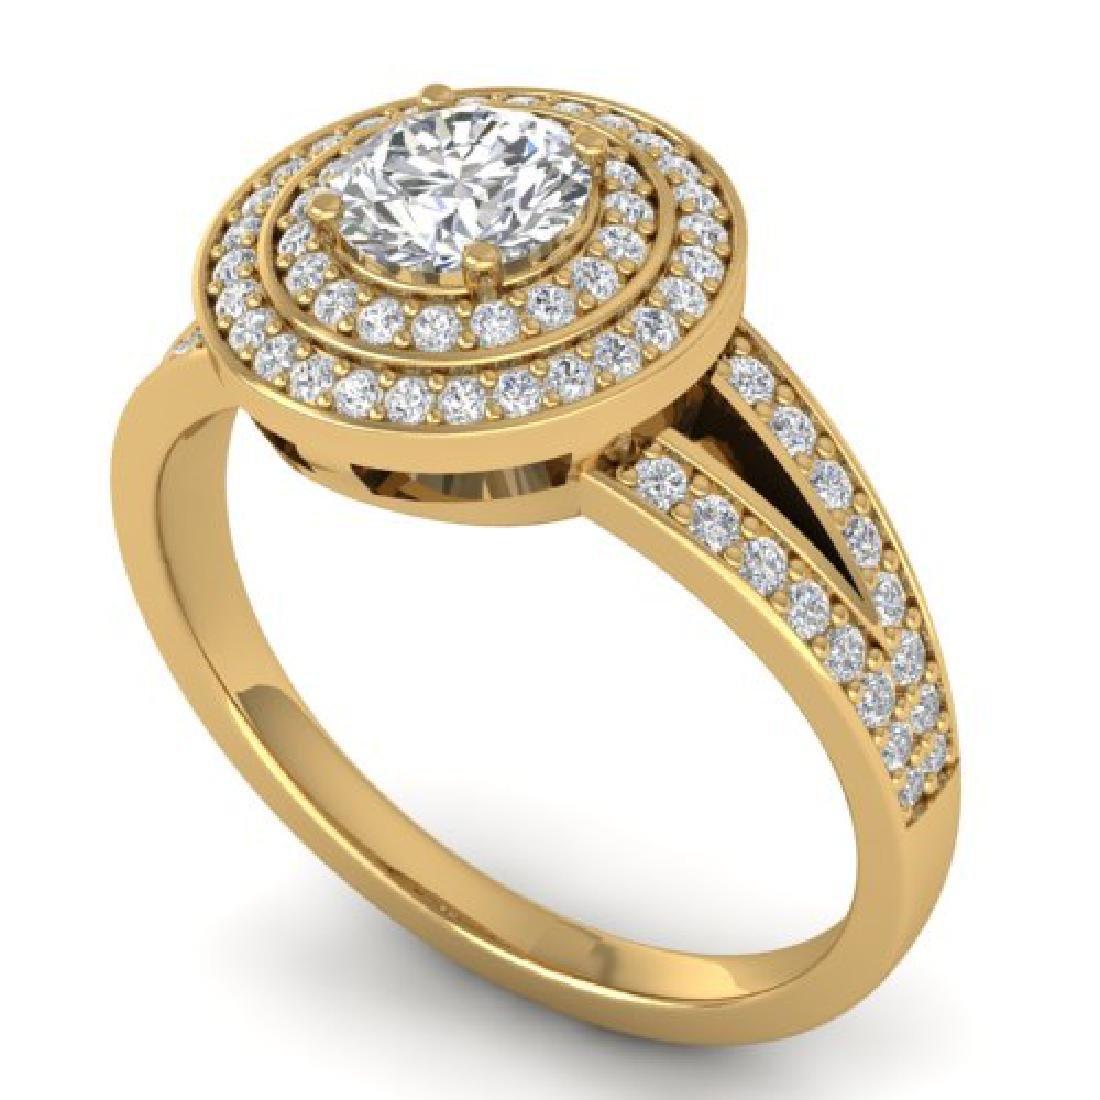 1.15 CTW Certified VS/SI Diamond Art Deco Halo Ring 18K - 2